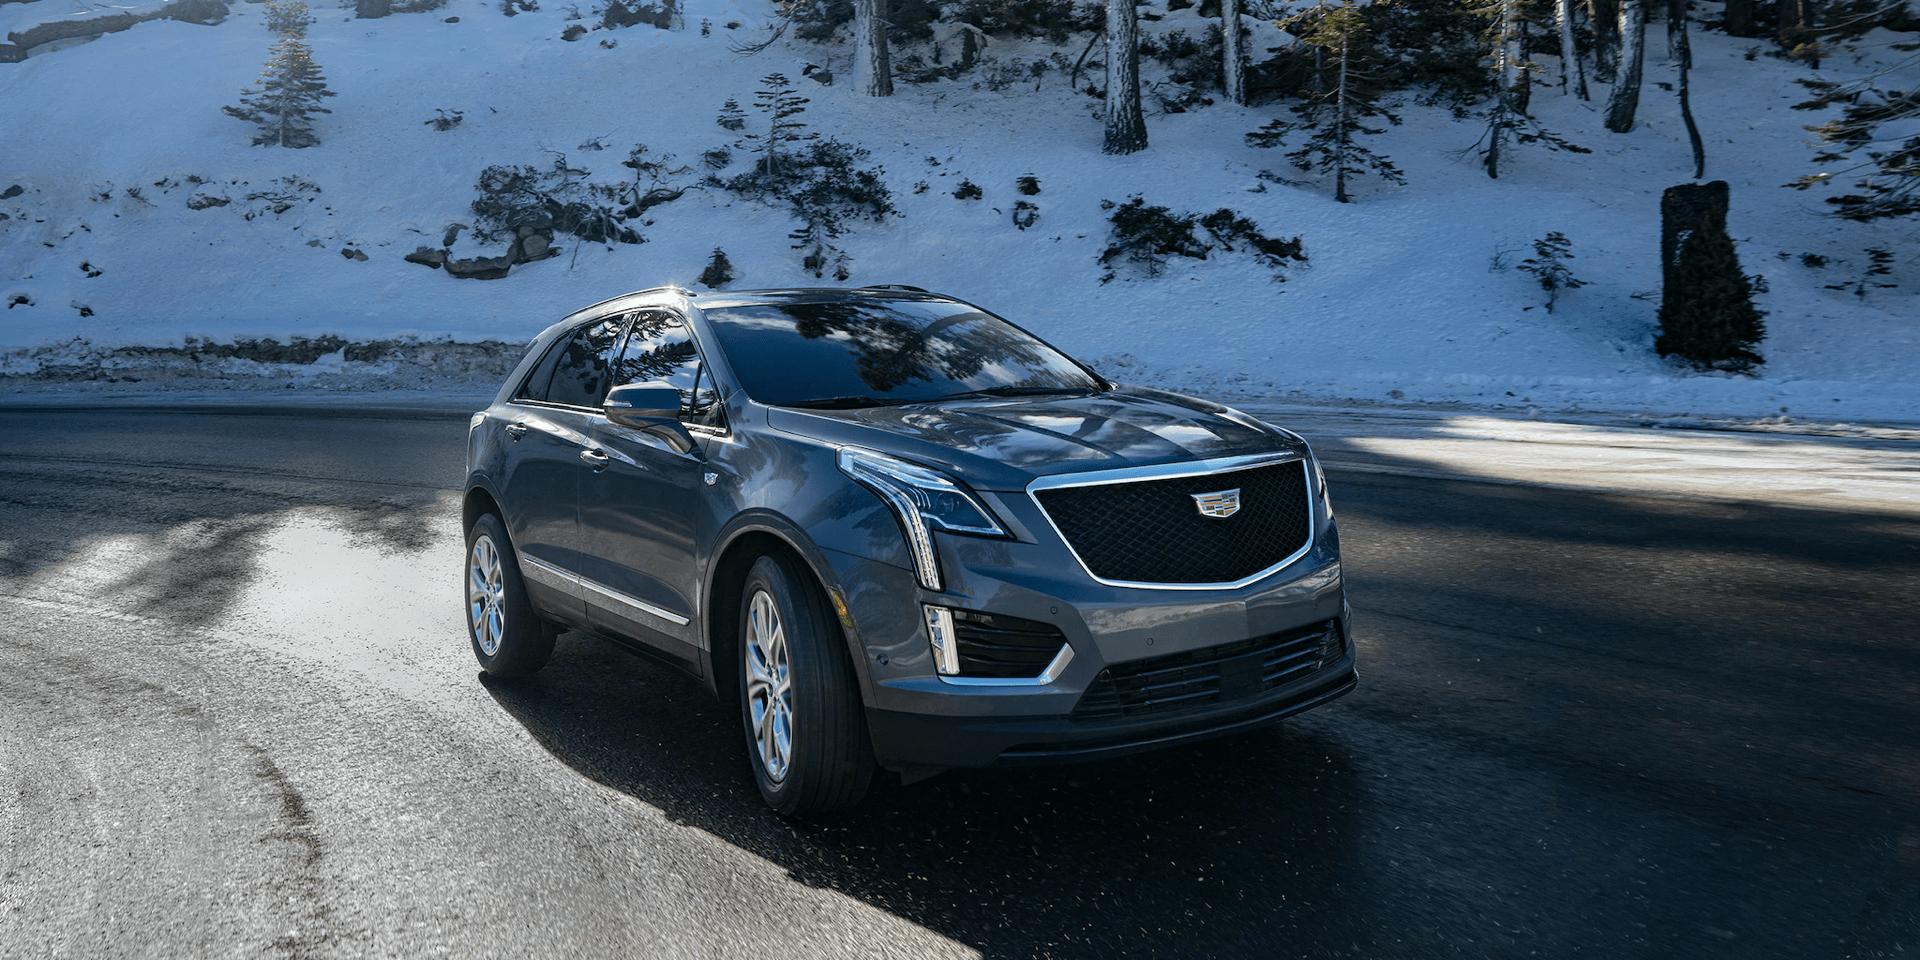 Cadillac XT5 drives on snowy road